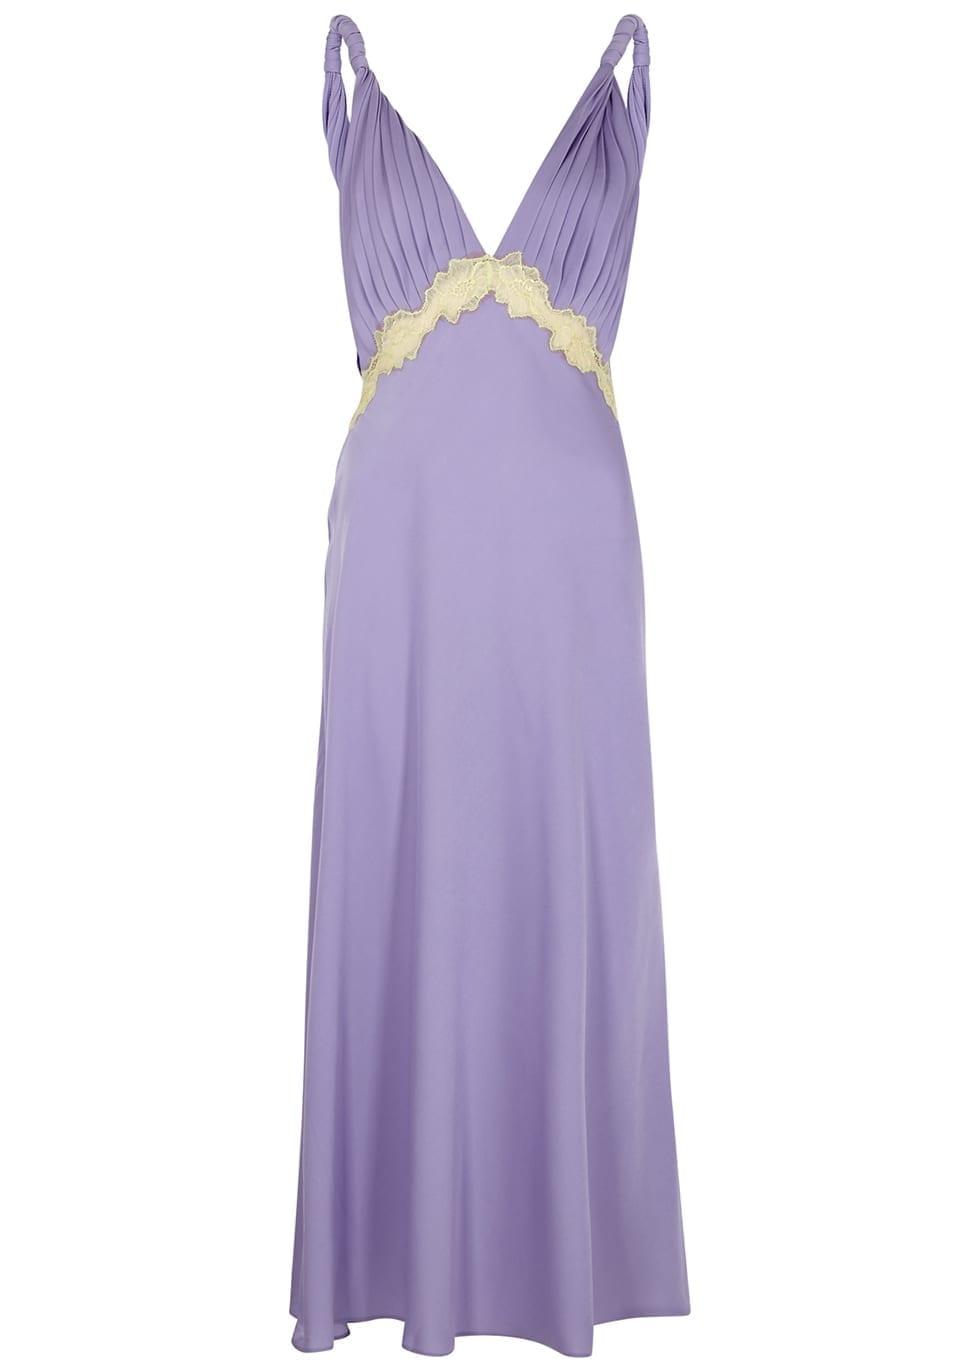 JONATHAN SIMKHAI Kiara Lilac Lace-trimmed Satin Dress